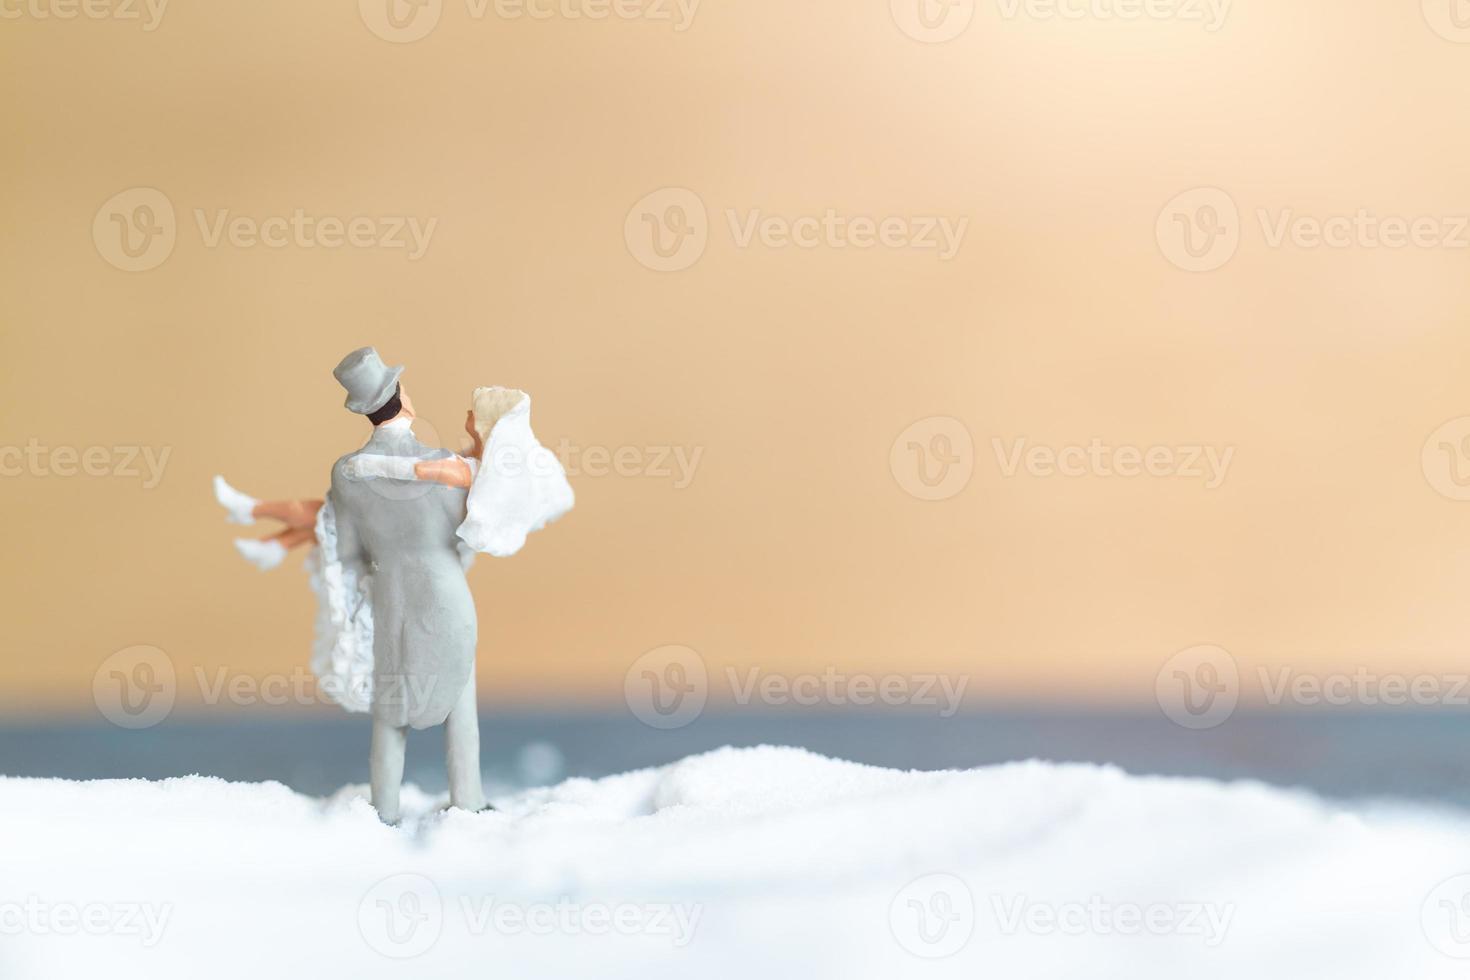 Miniature people, happy wedding couple on a white beach, wedding concept photo